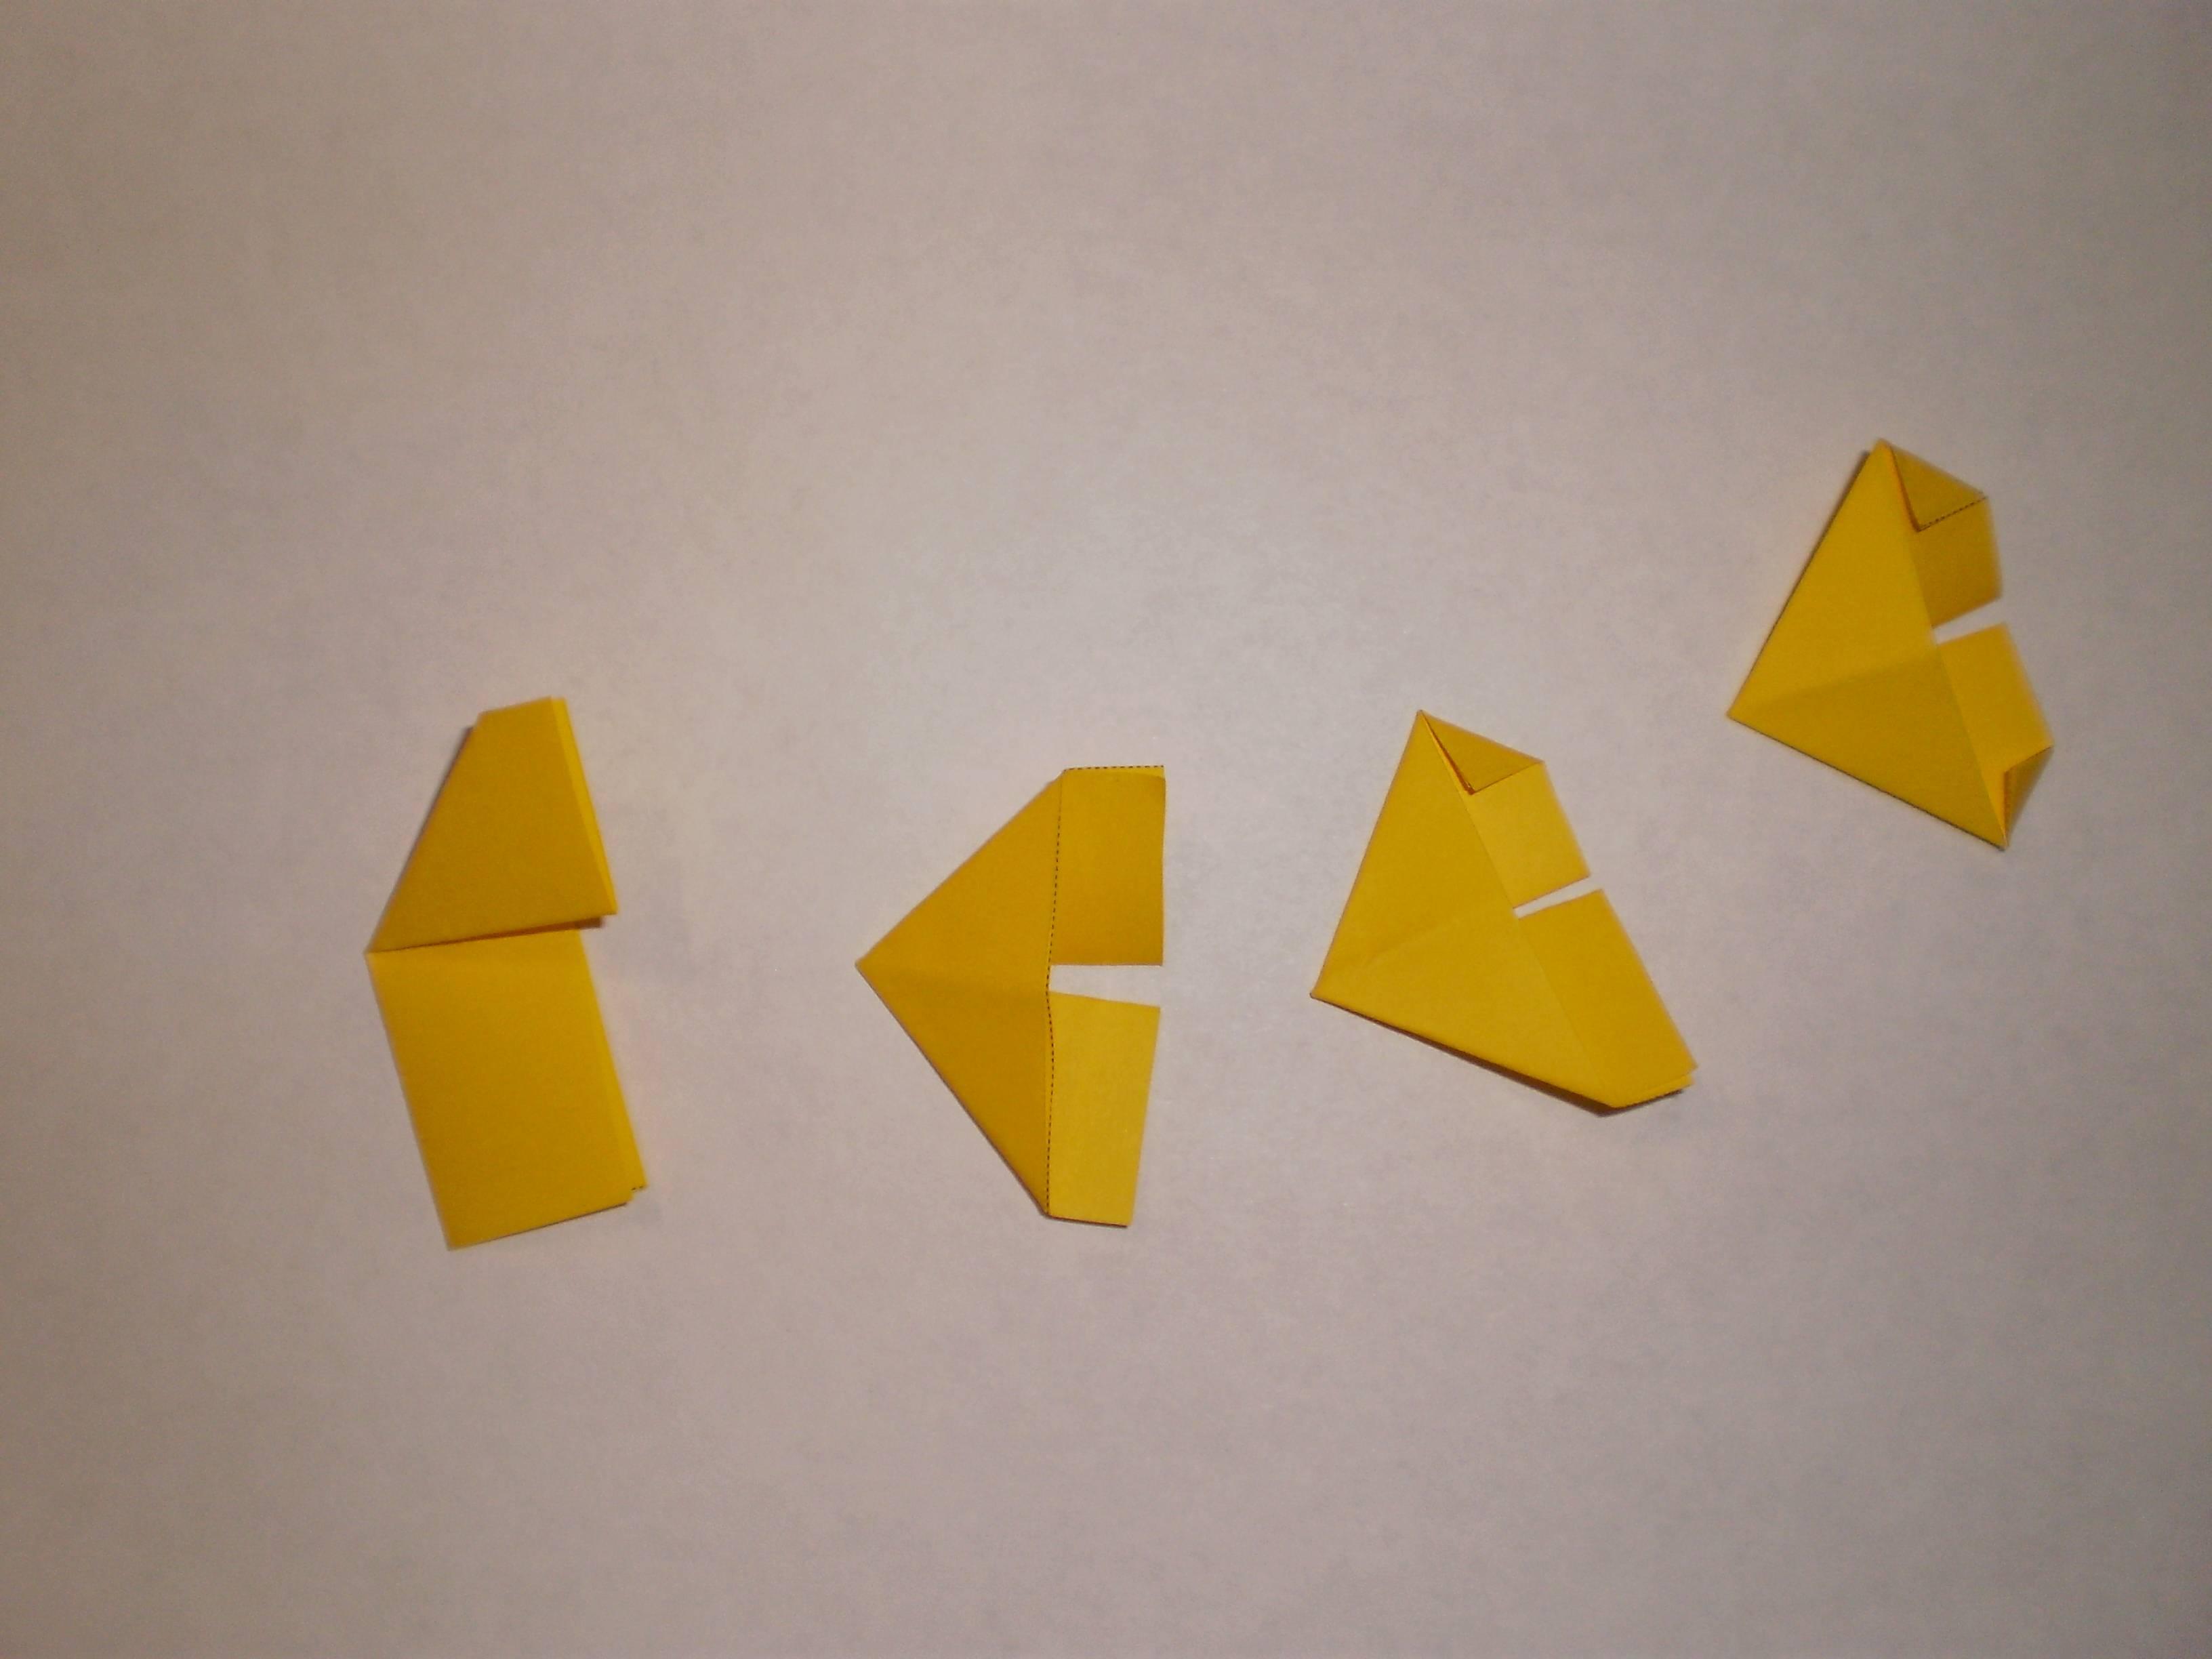 Набор участников на сборку Змеи - символ 2013. Модульное оригами! - Страница 2 F4ead180740356b8b954970fb2829923